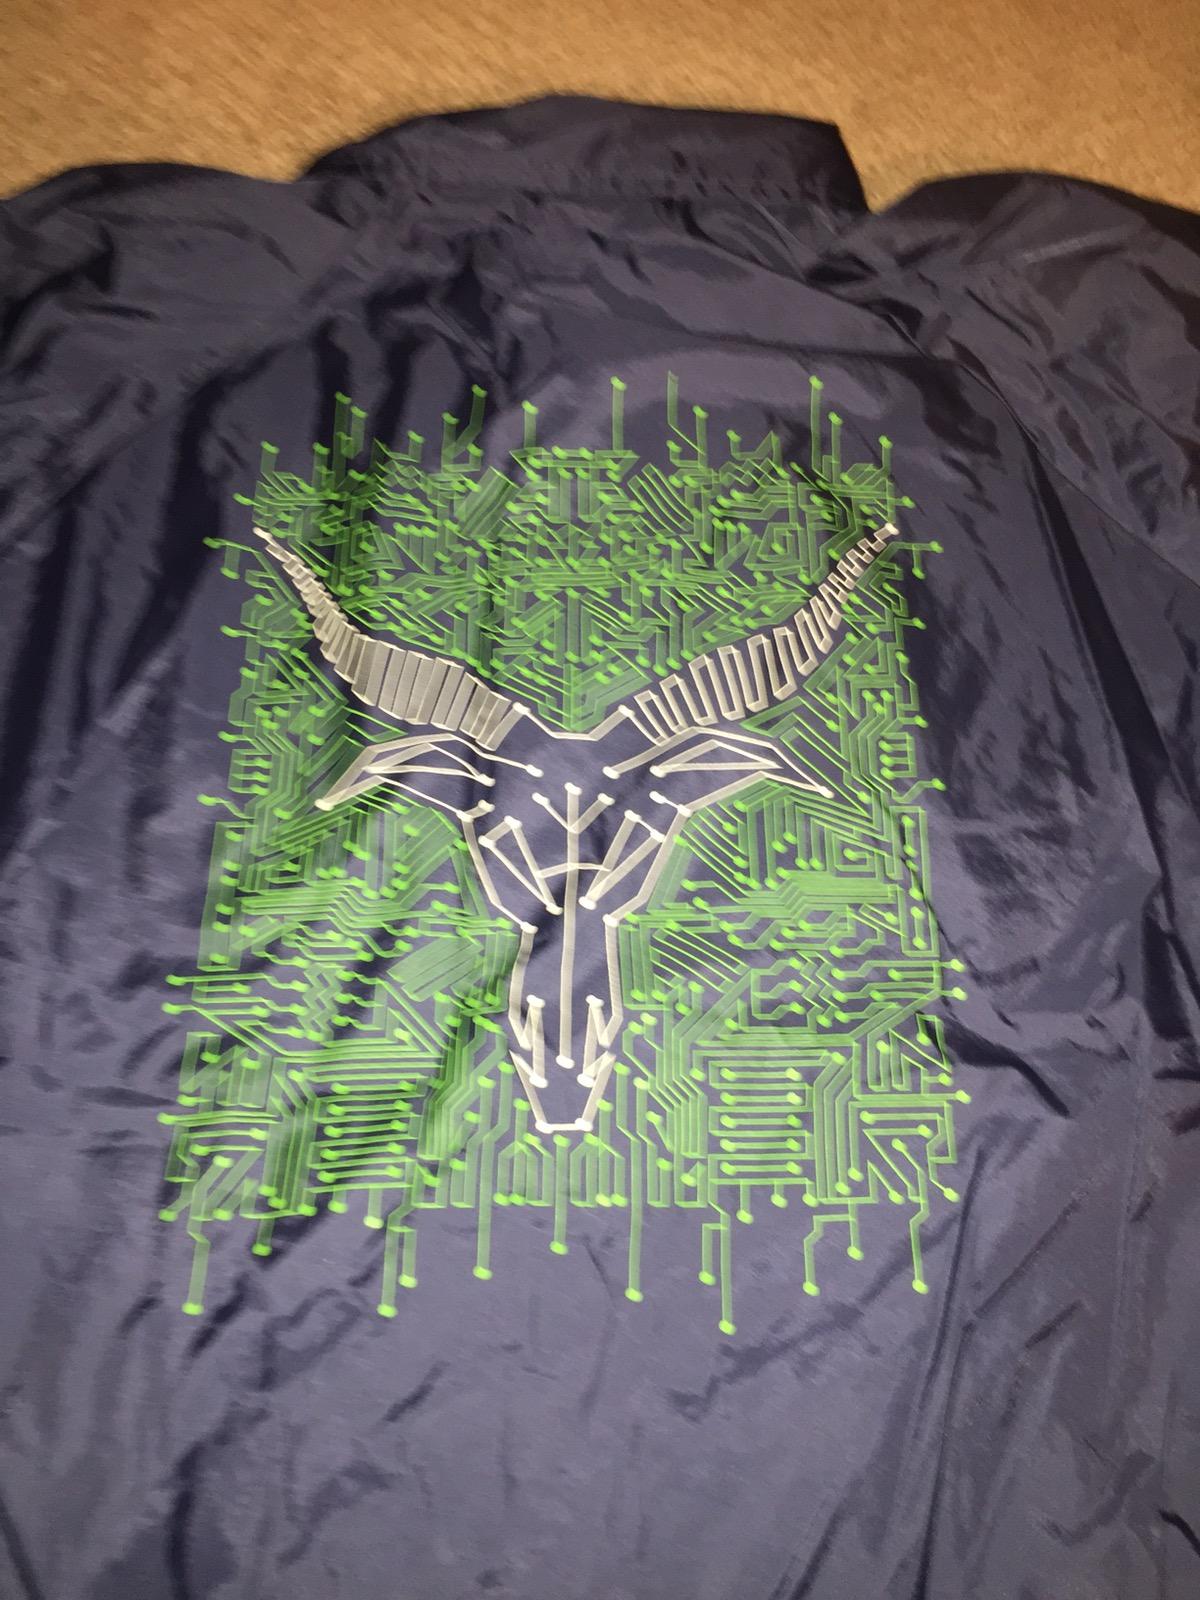 1cfba3693177 Thrasher Circuit Goat Coach Jacket Size m - Sweatshirts   Hoodies for Sale  - Grailed